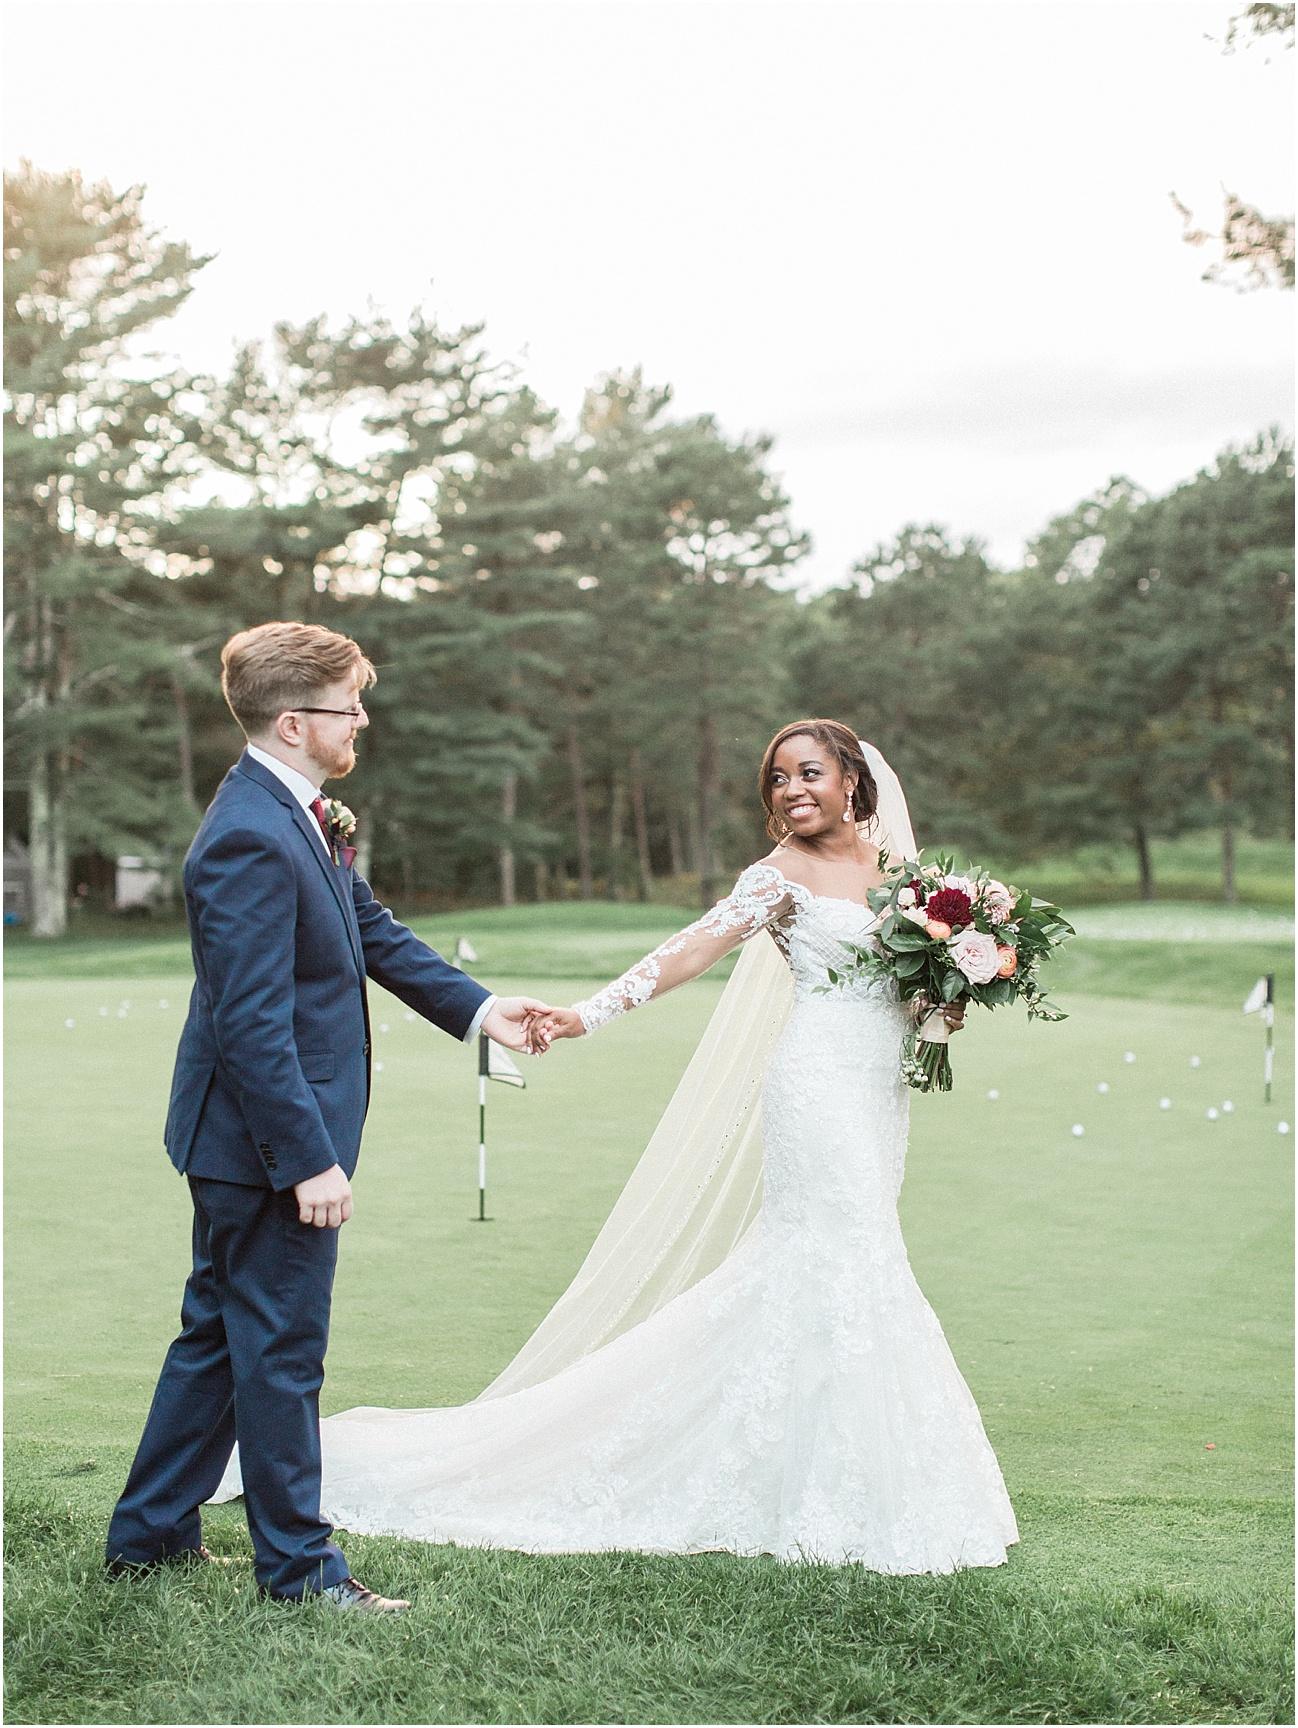 melissa_dan_the_pavilion_at_pine_hills_fall_wine_cape_cod_boston_wedding_photographer_meredith_jane_photography_photo_1210.jpg